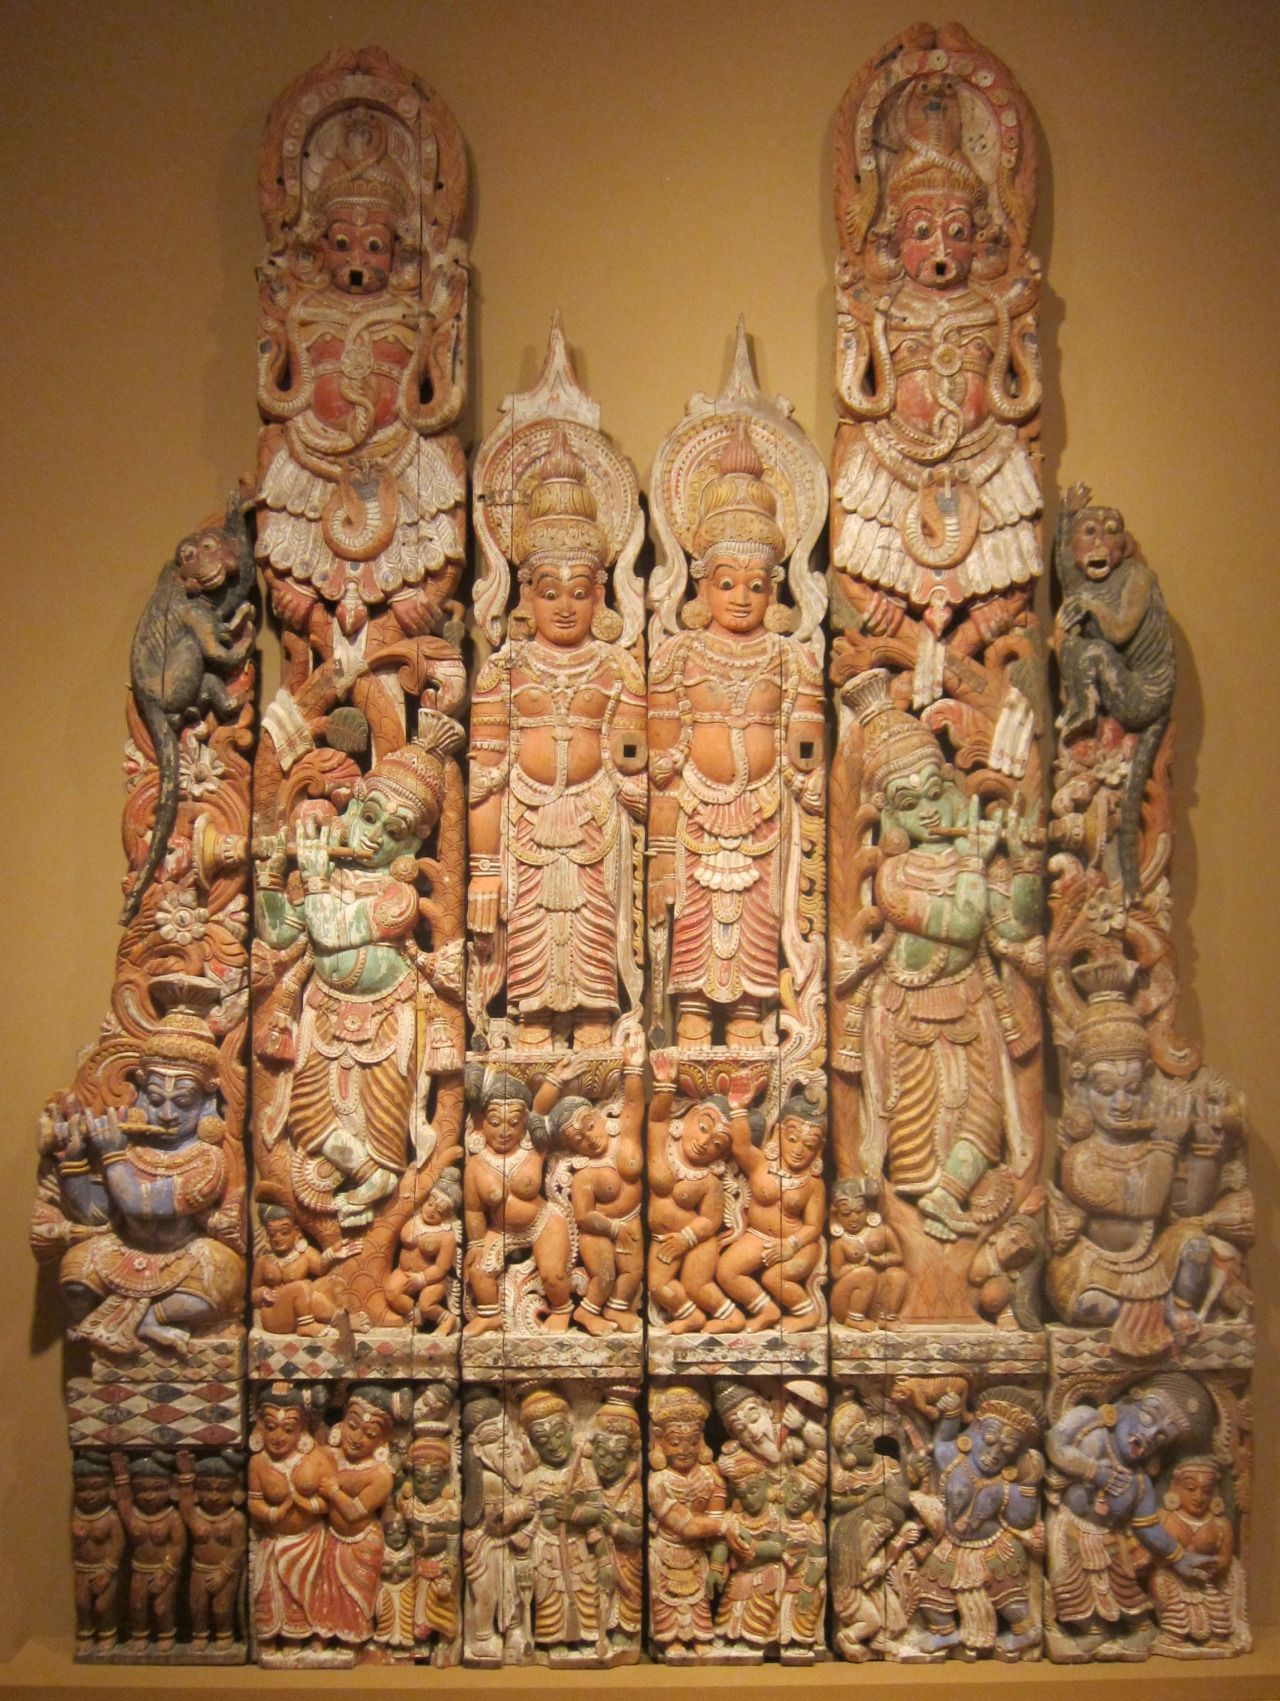 Hindu God Ganesh Lekshmi Devi Wall Vertical Panel Pair Wooden Vintage Sculpture